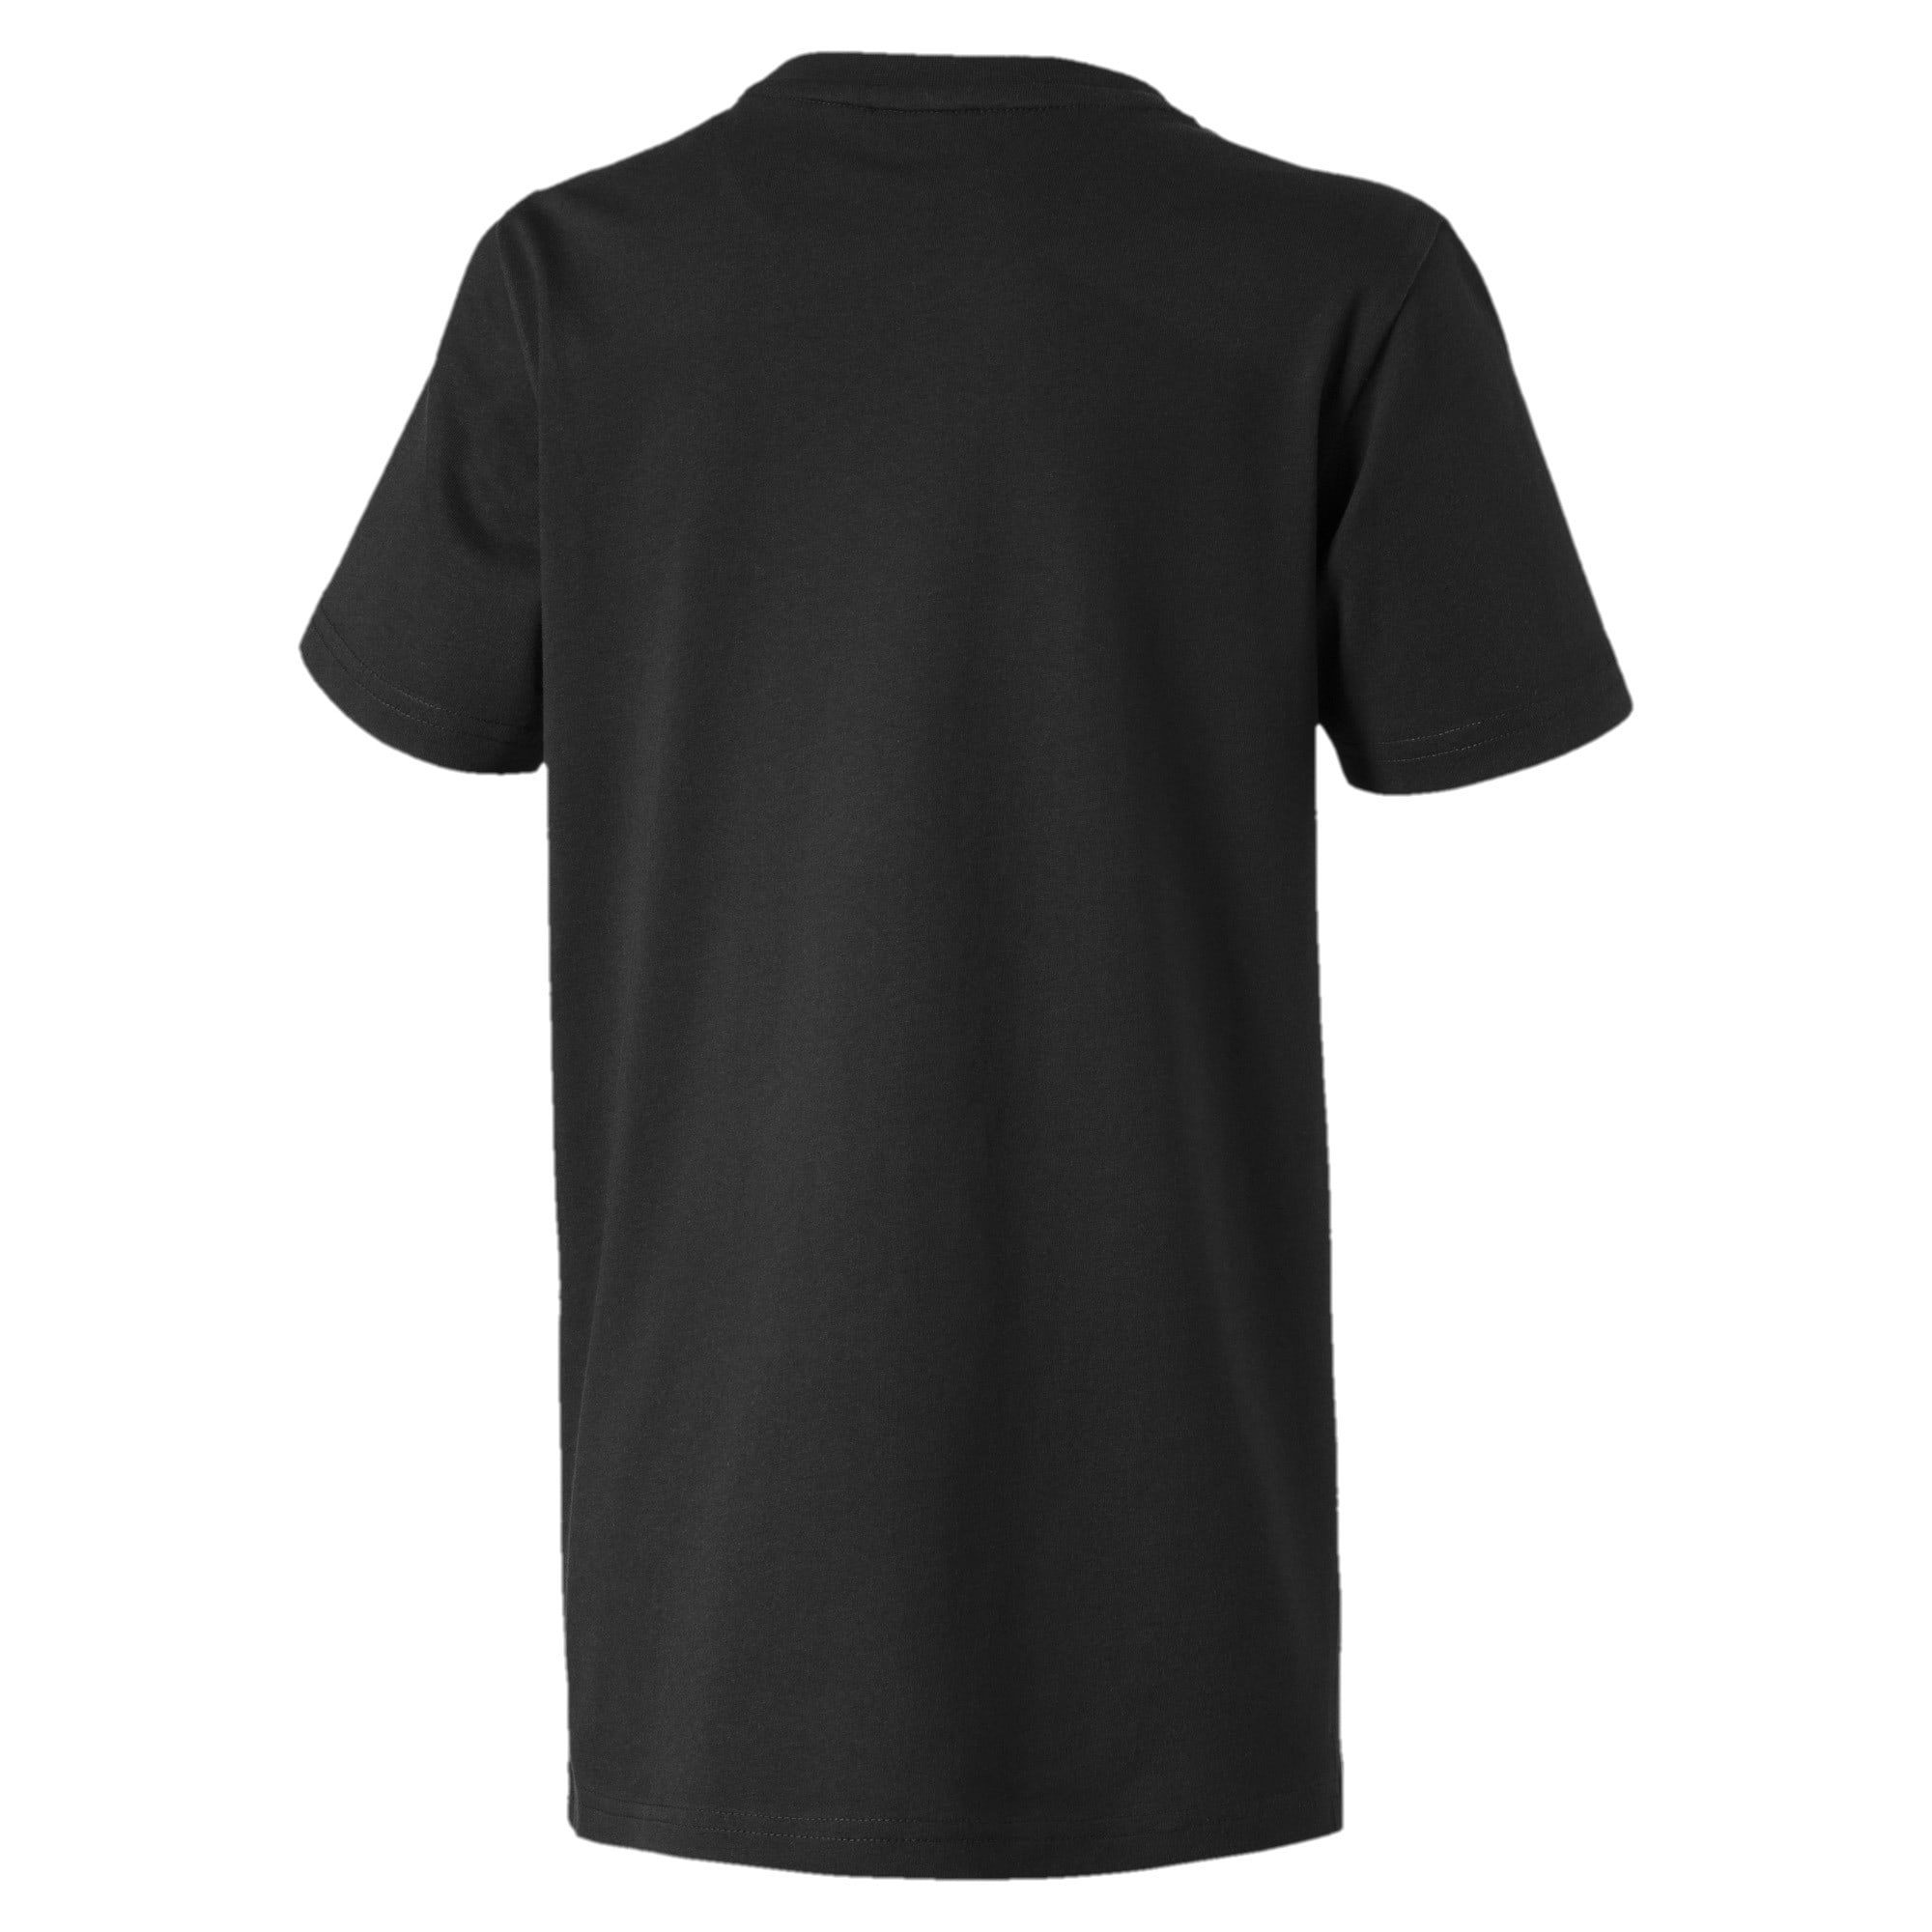 Thumbnail 2 of Alpha Graphic Jungen T-Shirt, Puma Black, medium